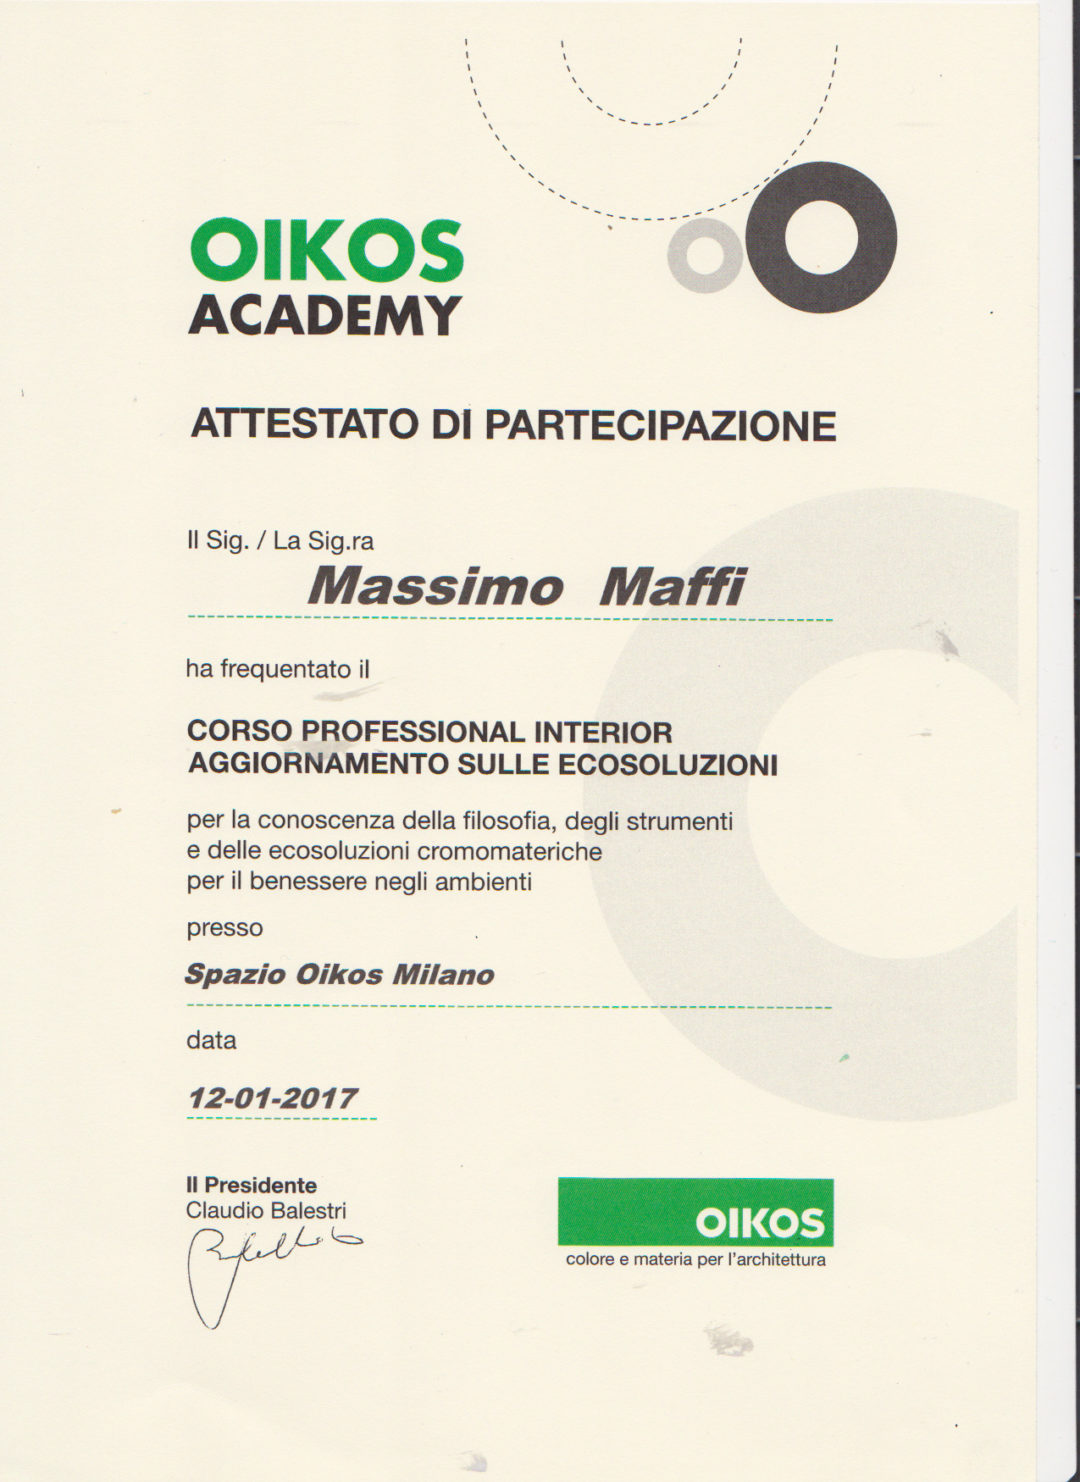 corso professional interior OIKOS